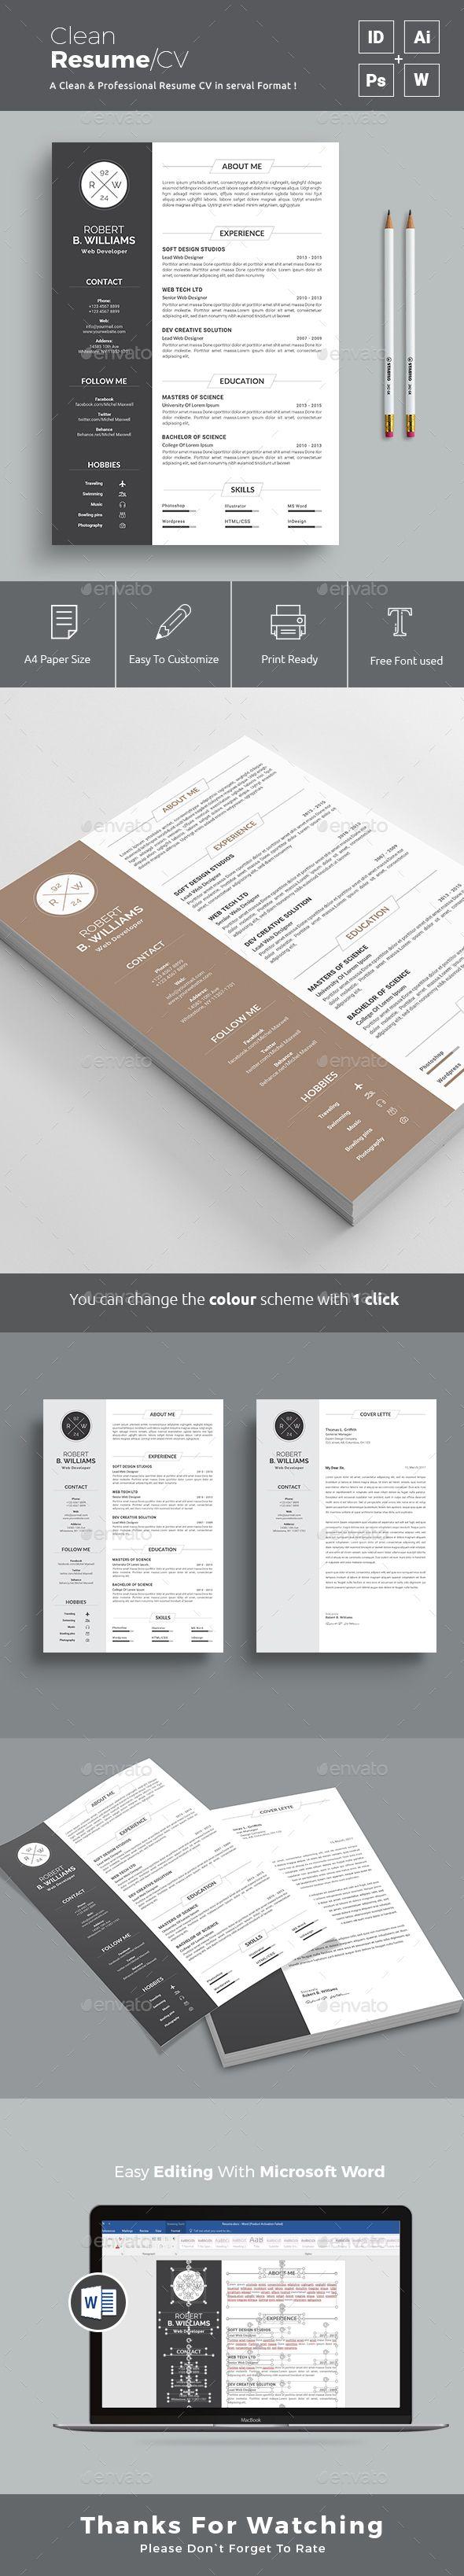 resume template cv template bundle 4 creative cv design with 20